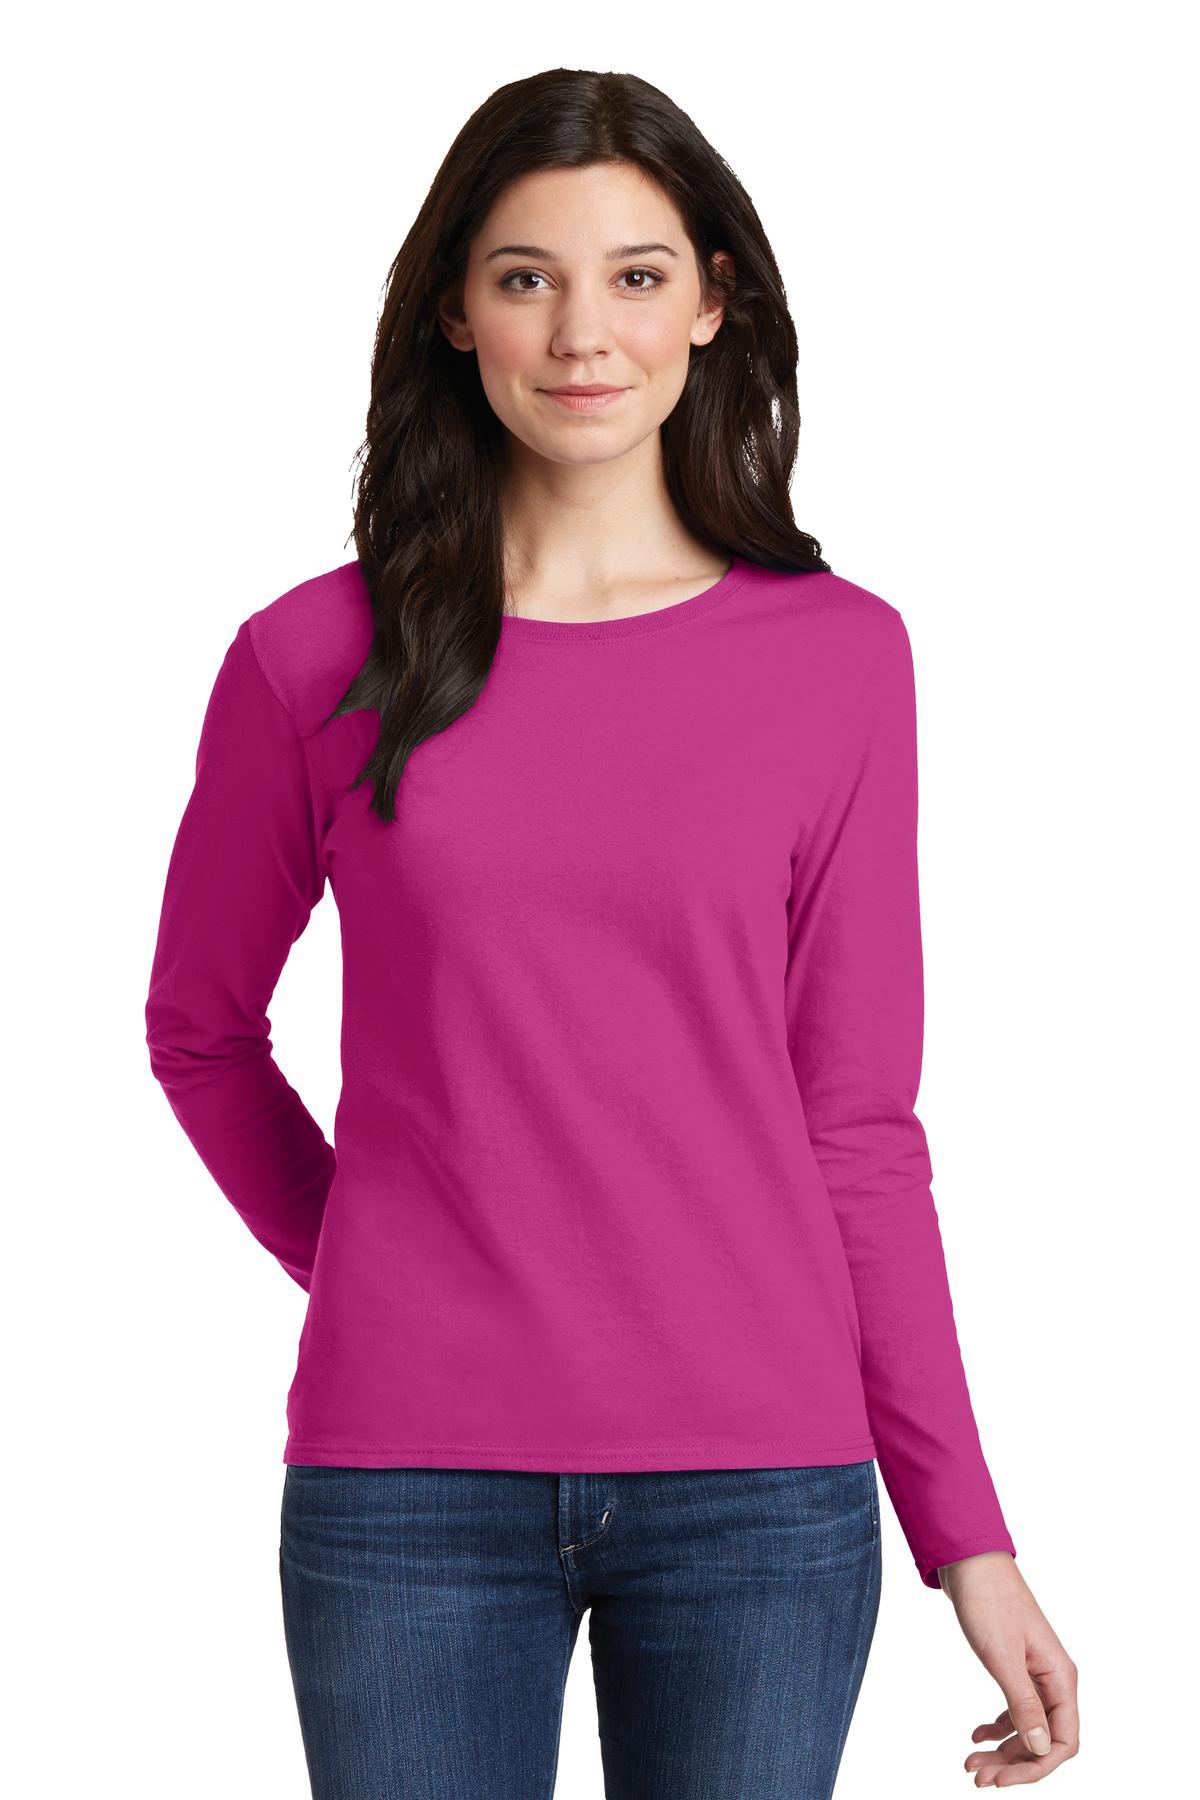 Gildan Ladies Heavy Cotton 100% Cotton Long Sleeve T-Shirt